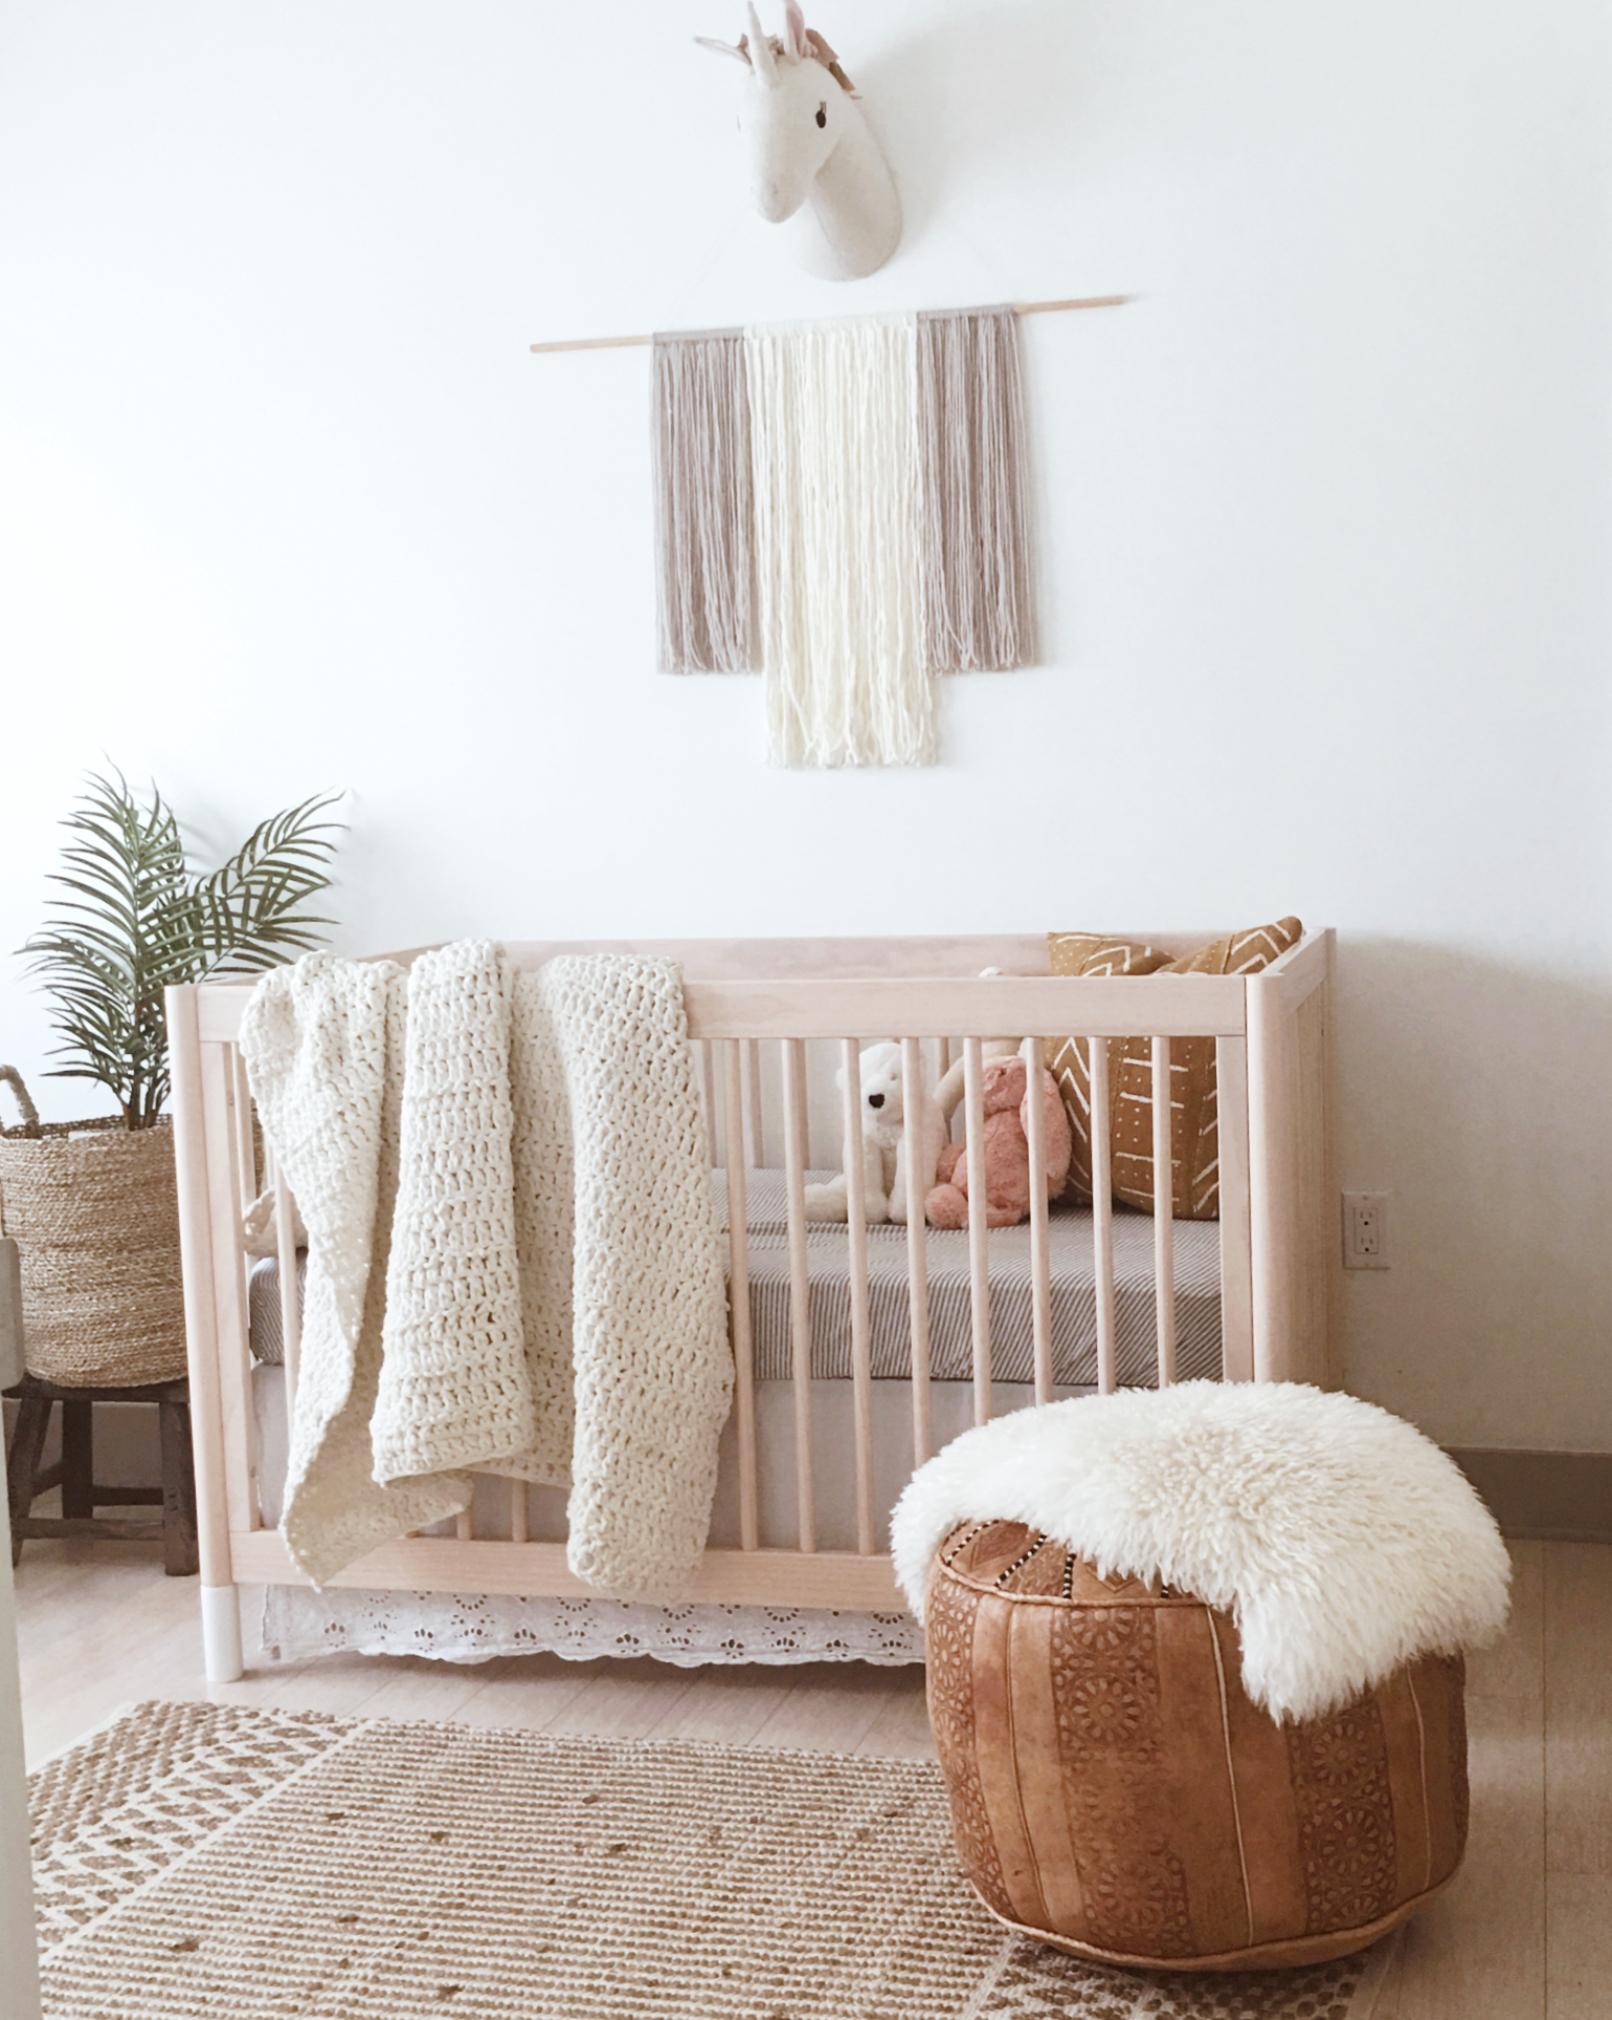 Post The Modhemian Neutral Nursery Decor Boho Baby Dwellings The Modhemian